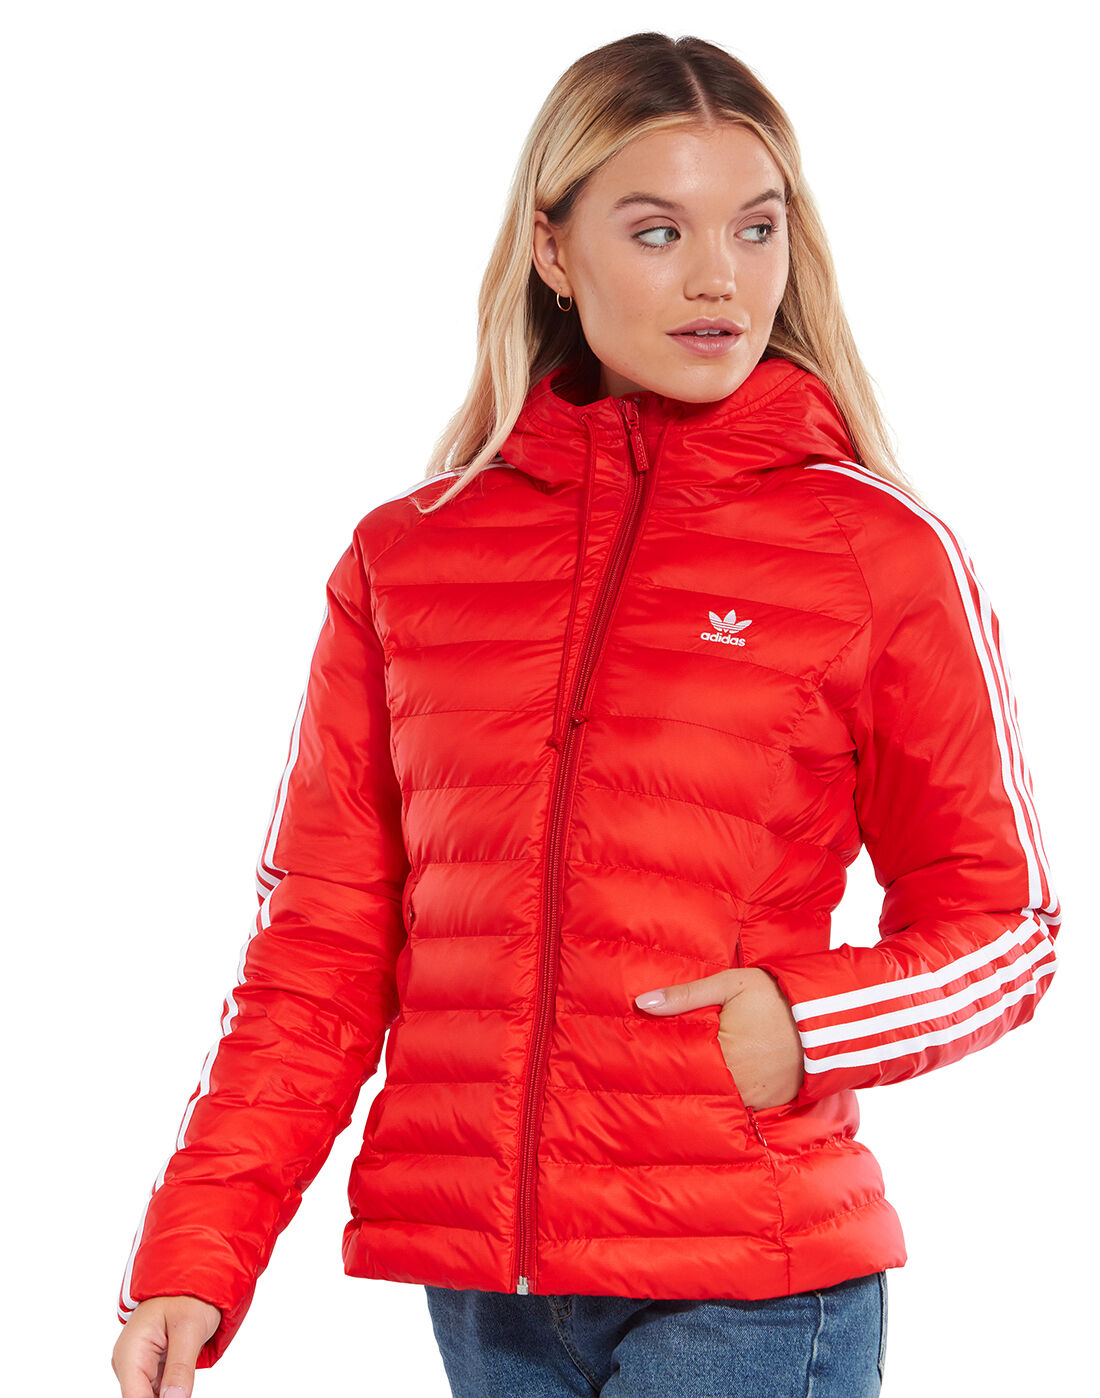 adidas Originals Womens Slim Jacket